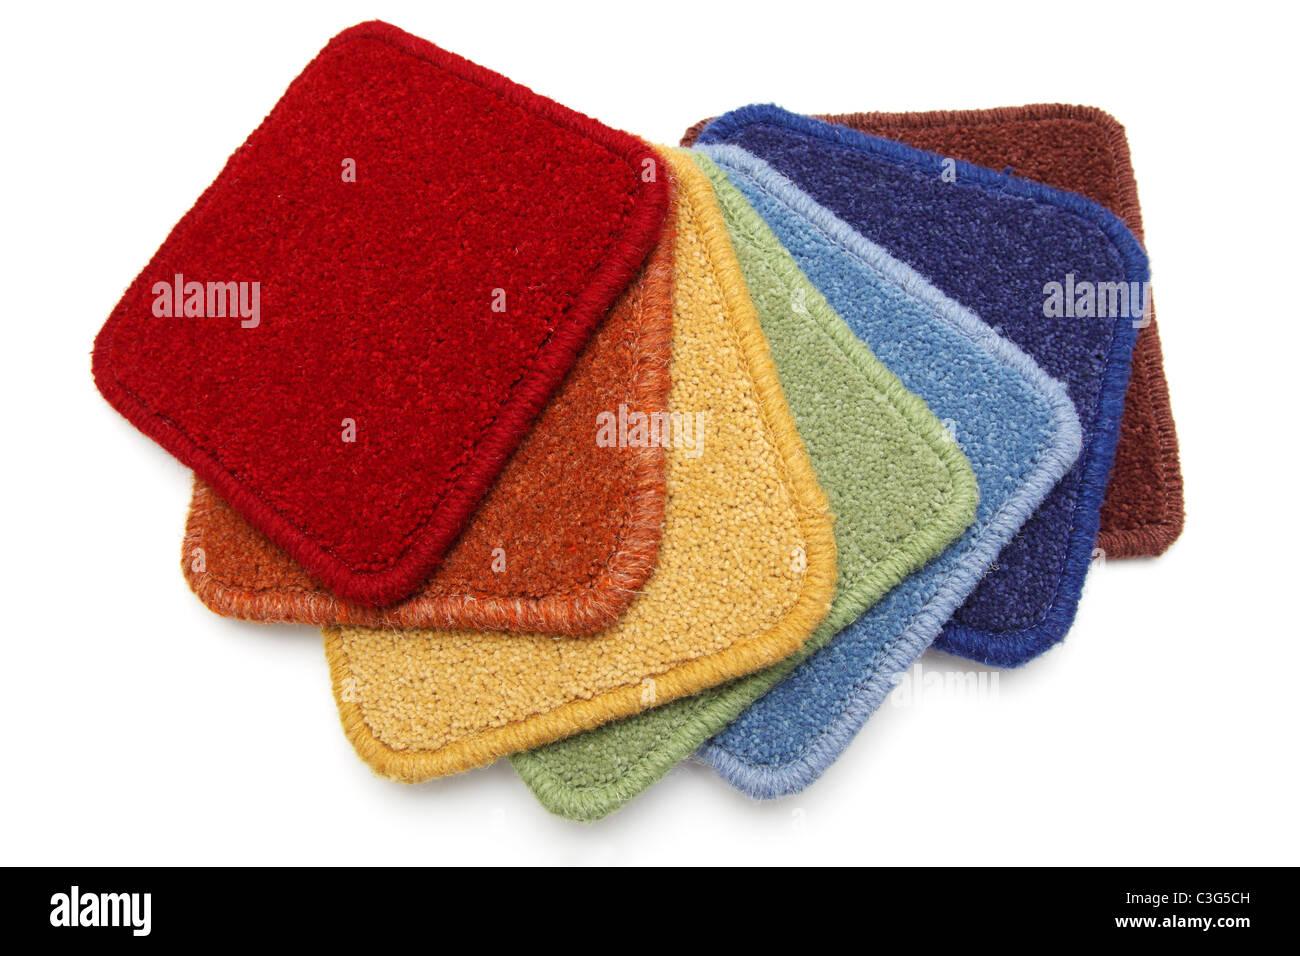 Carpet samples - Stock Image